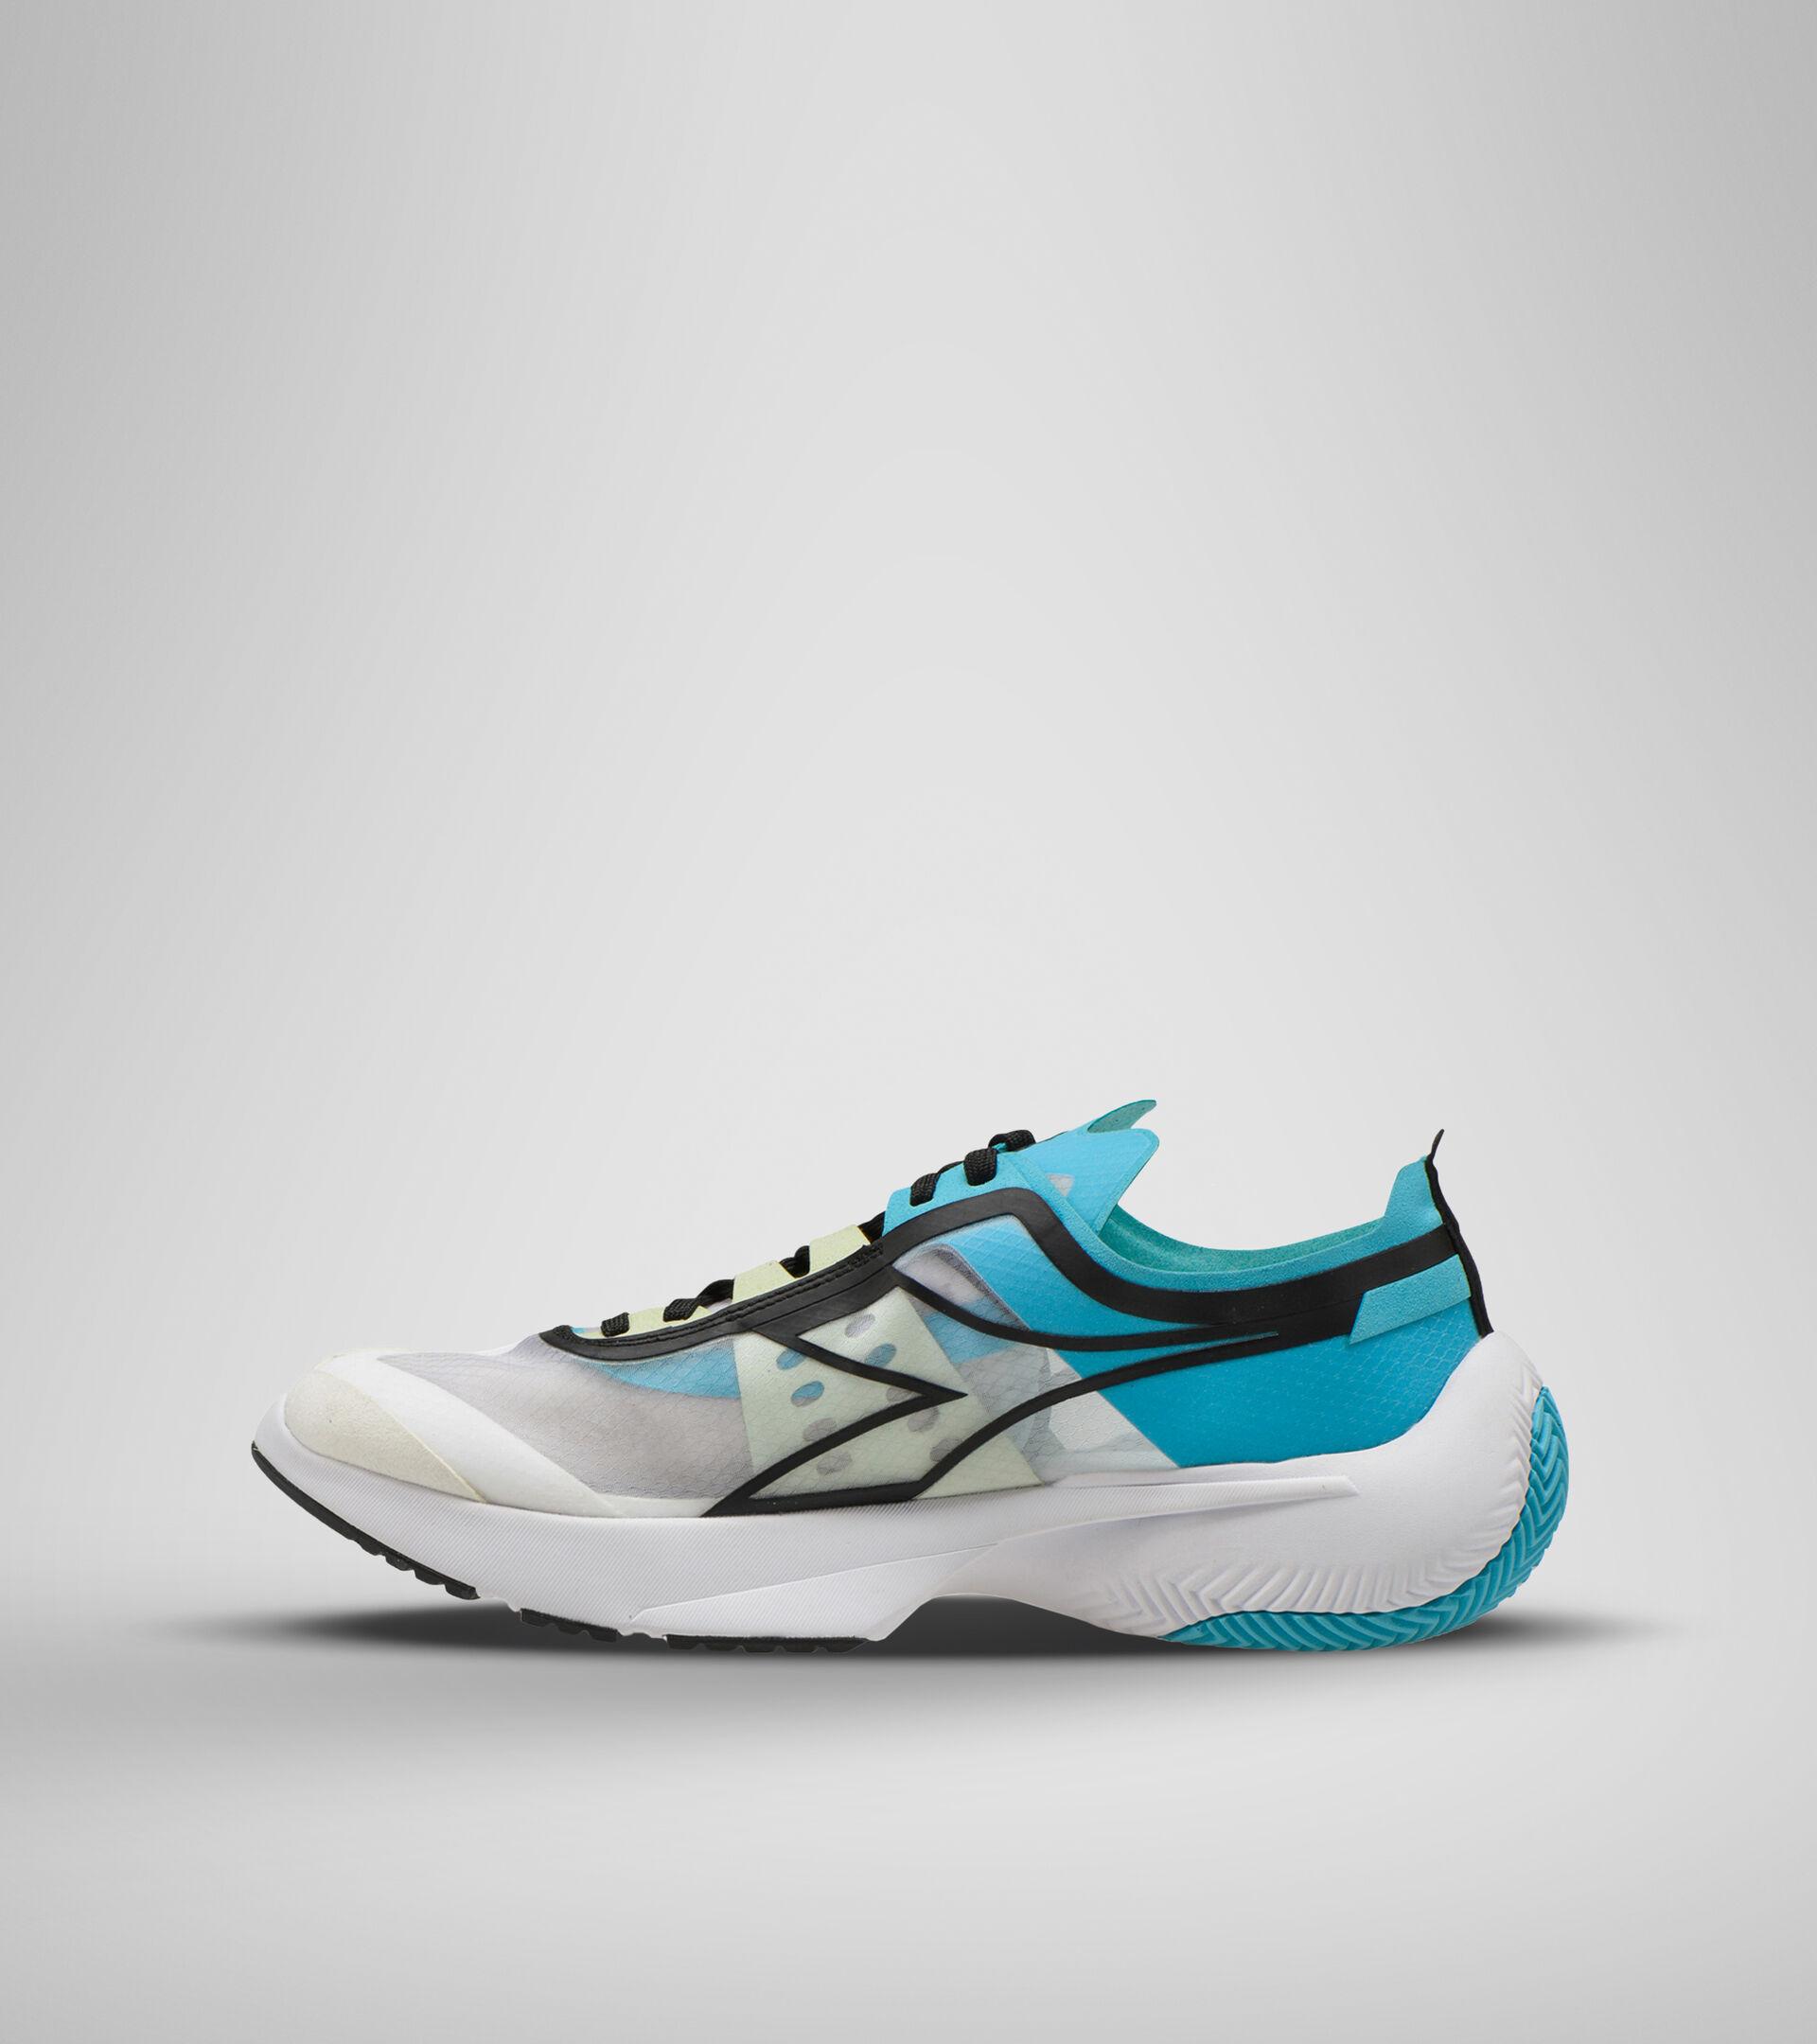 Footwear Sportswear UNISEX URBAN EQUIPE BIANCO/VERDE PASTELLO Diadora